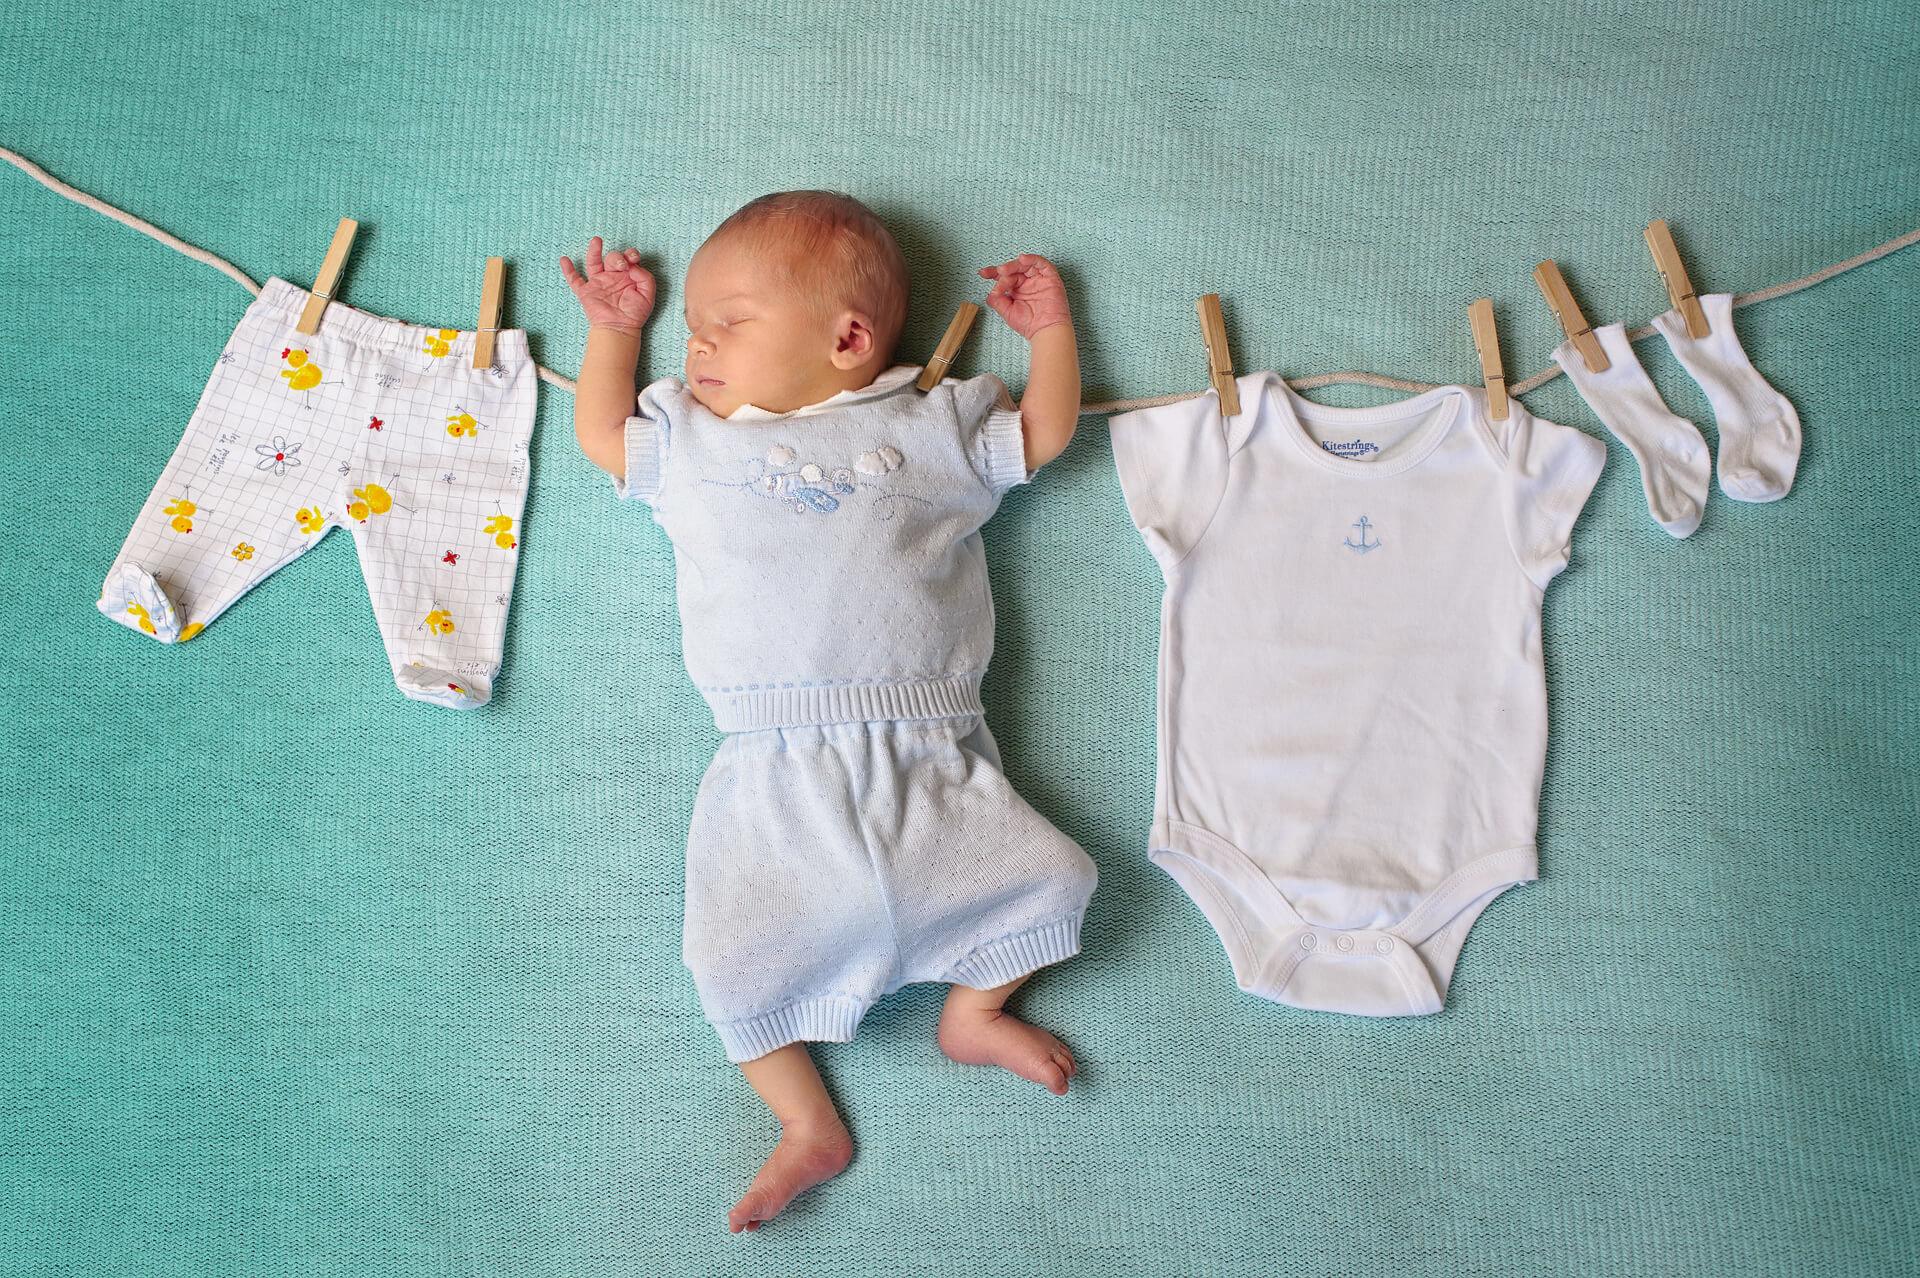 novorodenec-newborn-atelier-interier-profesionalne-fotenie-fotograf-kosice-peter-norulak_06